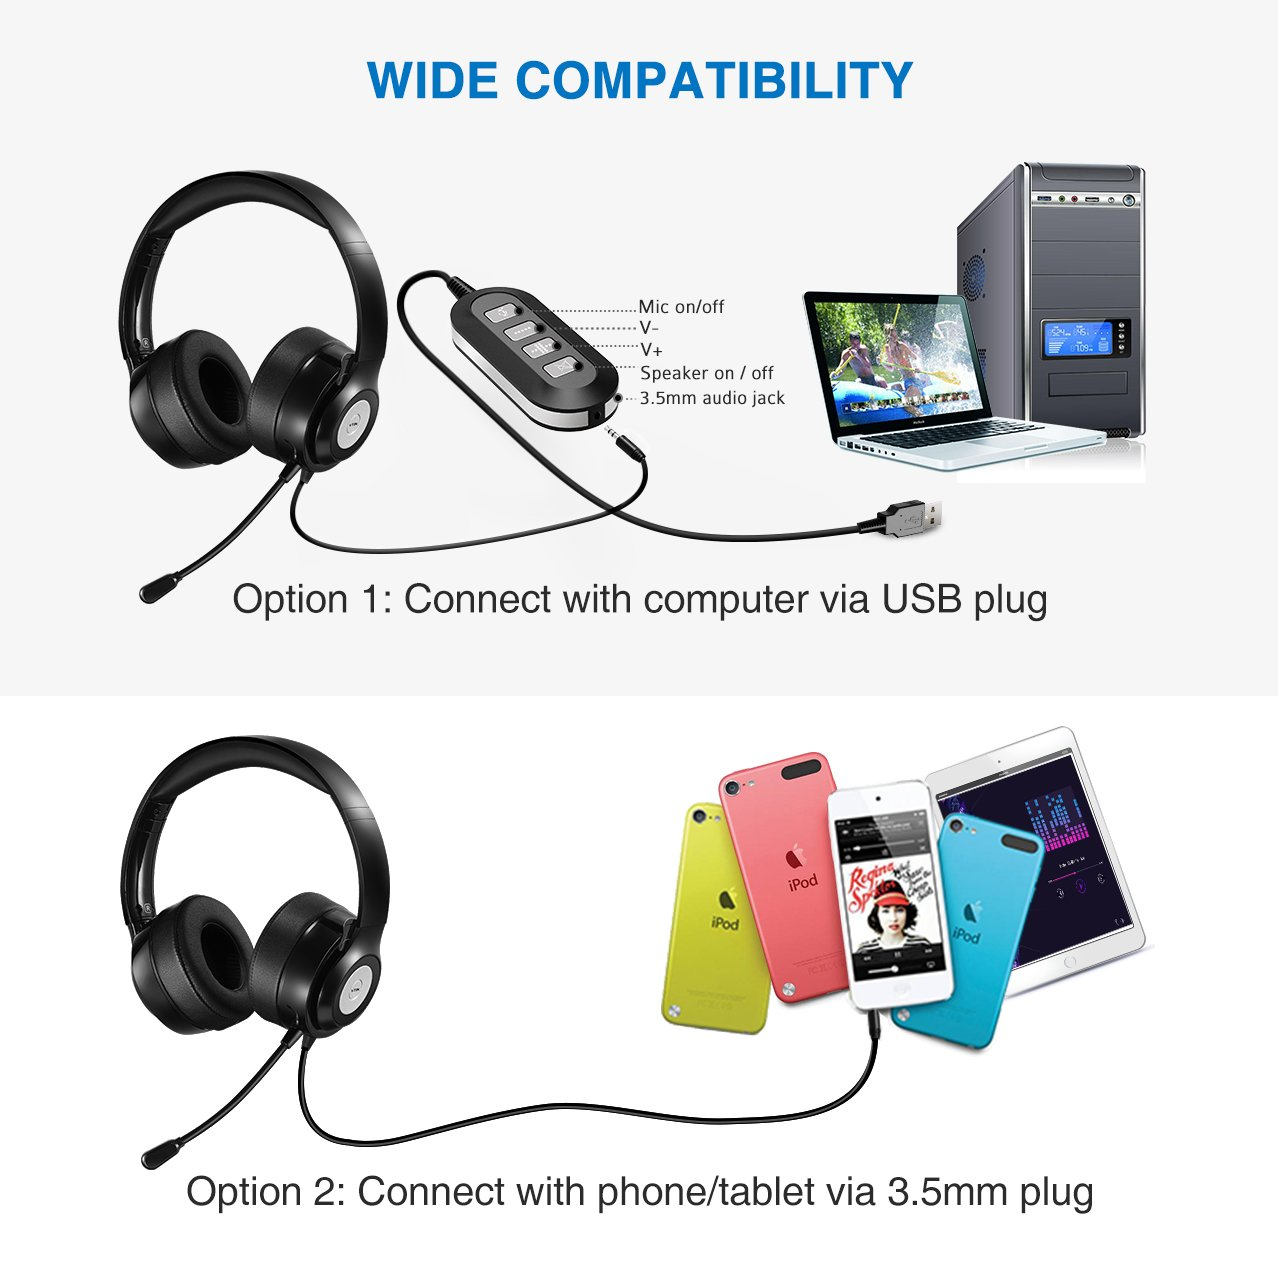 Vtin Headset With Microphone Usb Headset 3 5mm Computer Headphone Headset 619125641755 Ebay